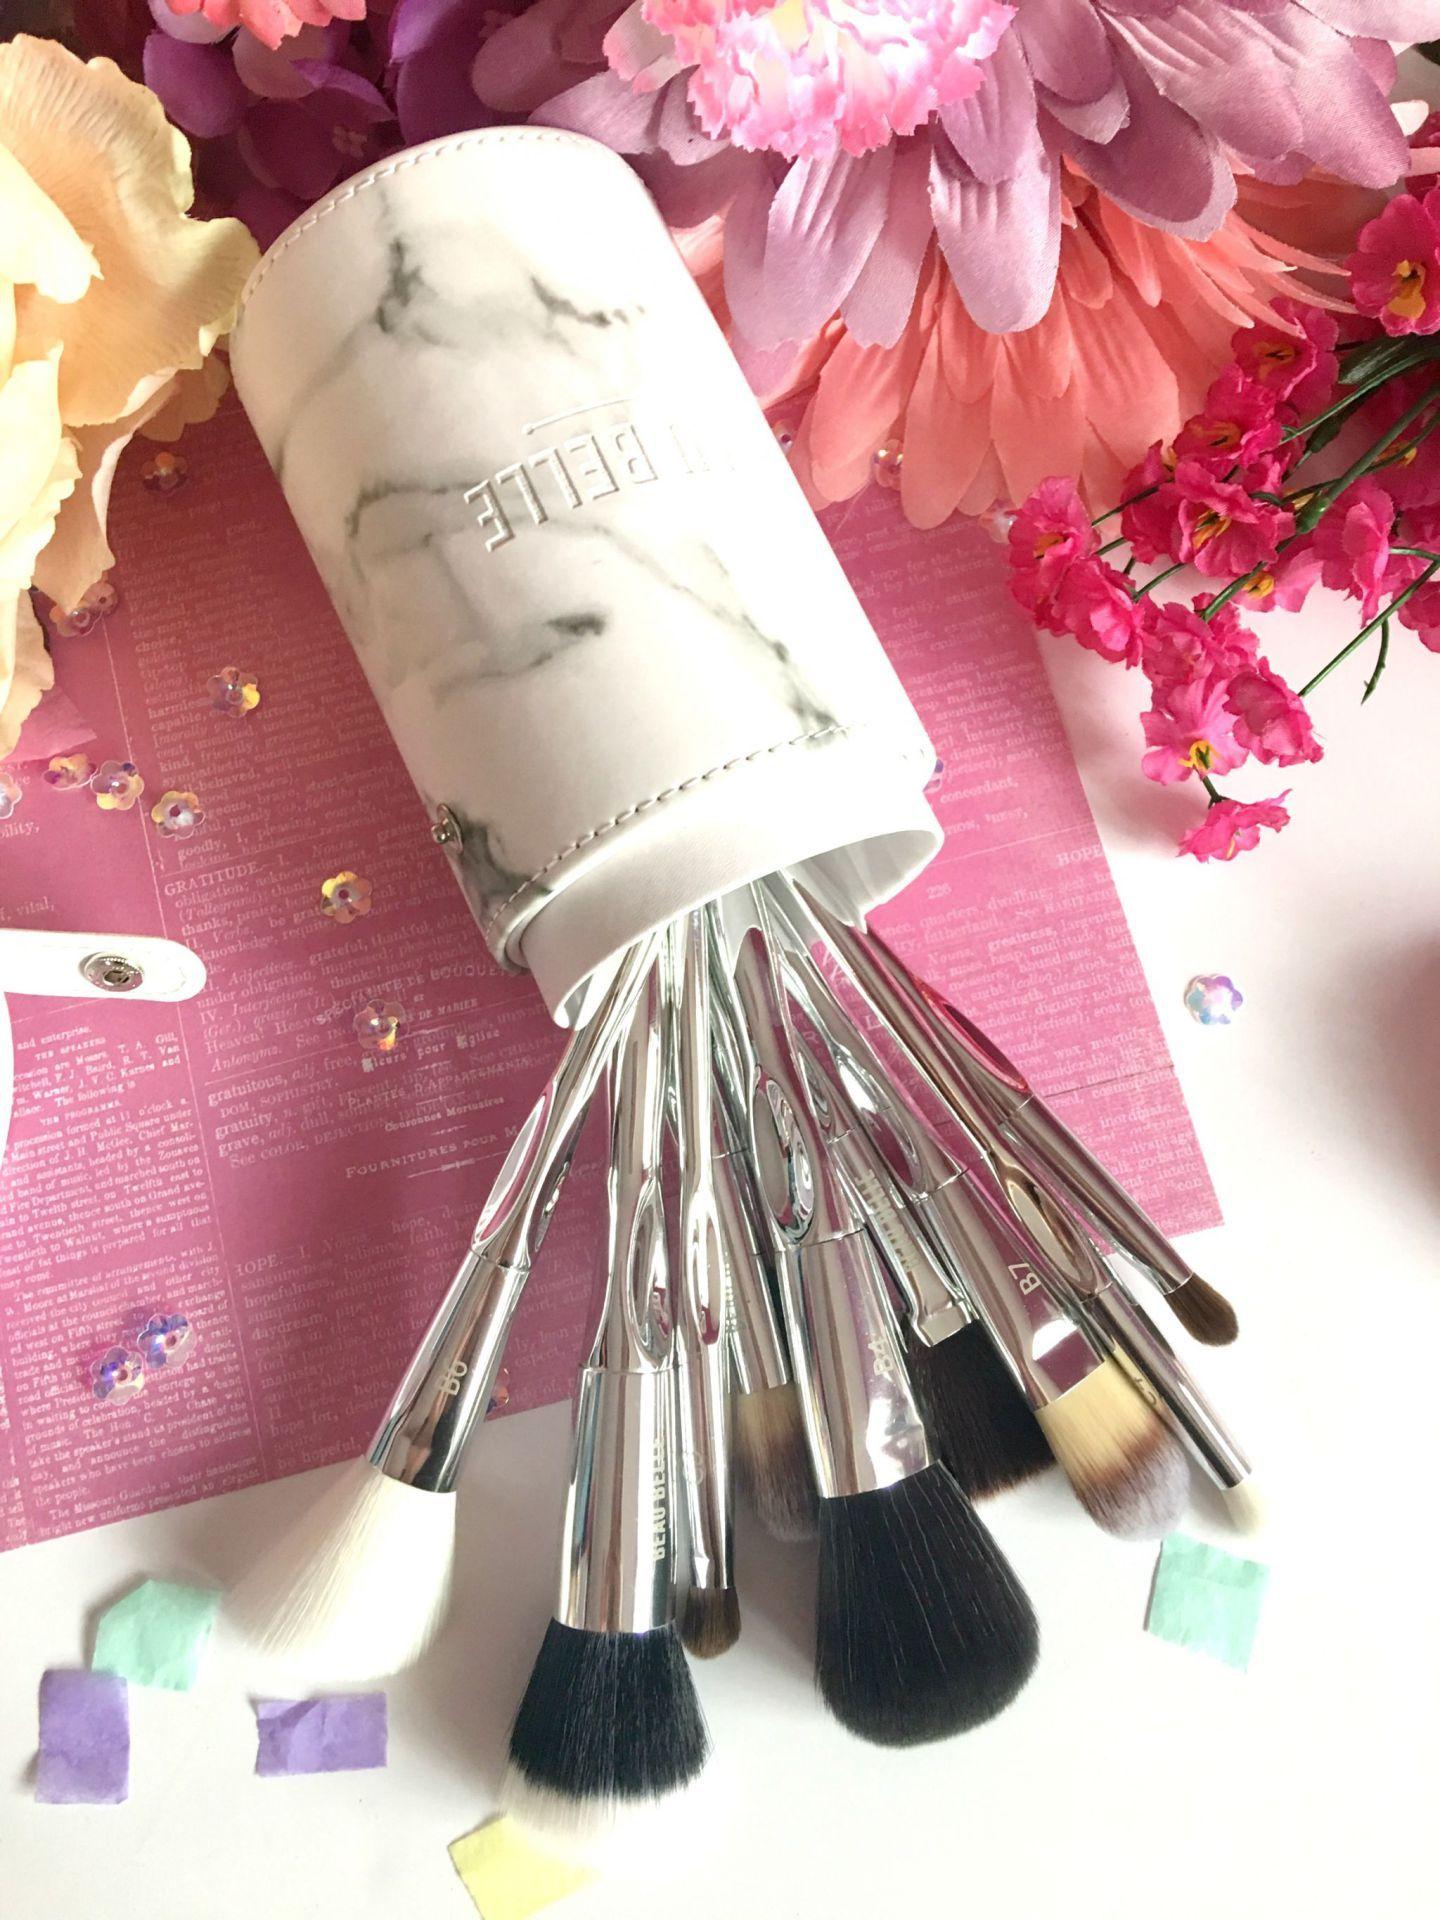 Beau Belle Marble Makeup Brush Set Makeup brush set